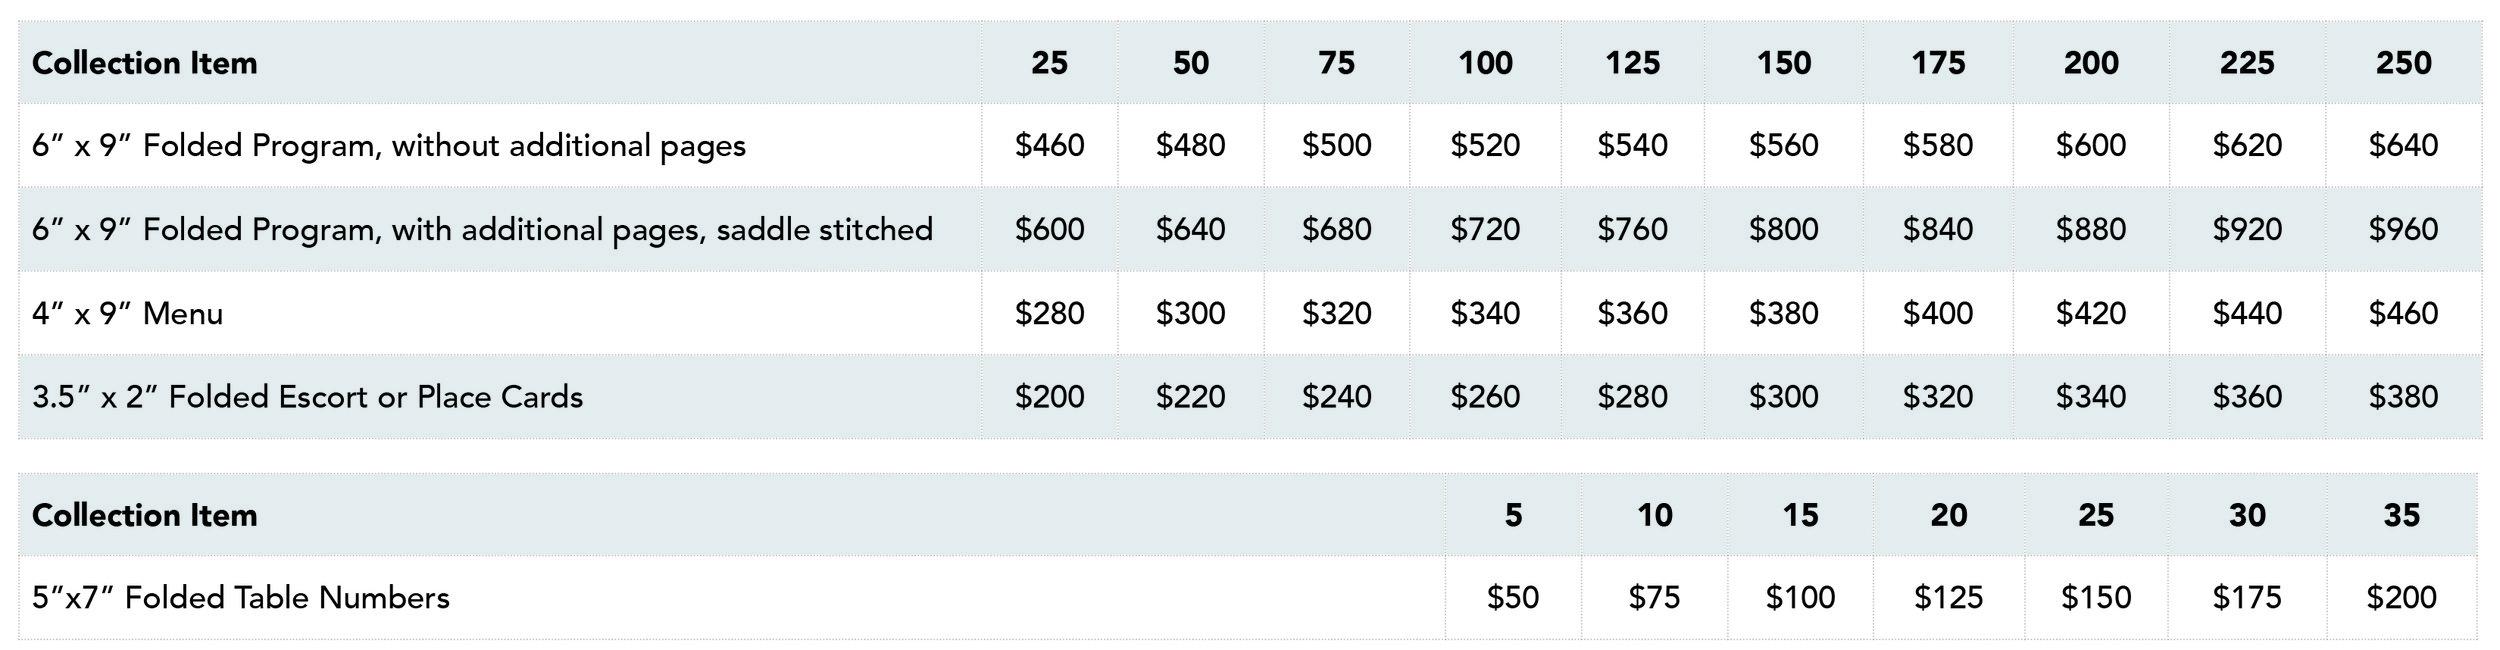 Pricing Chart_DayOfjpg